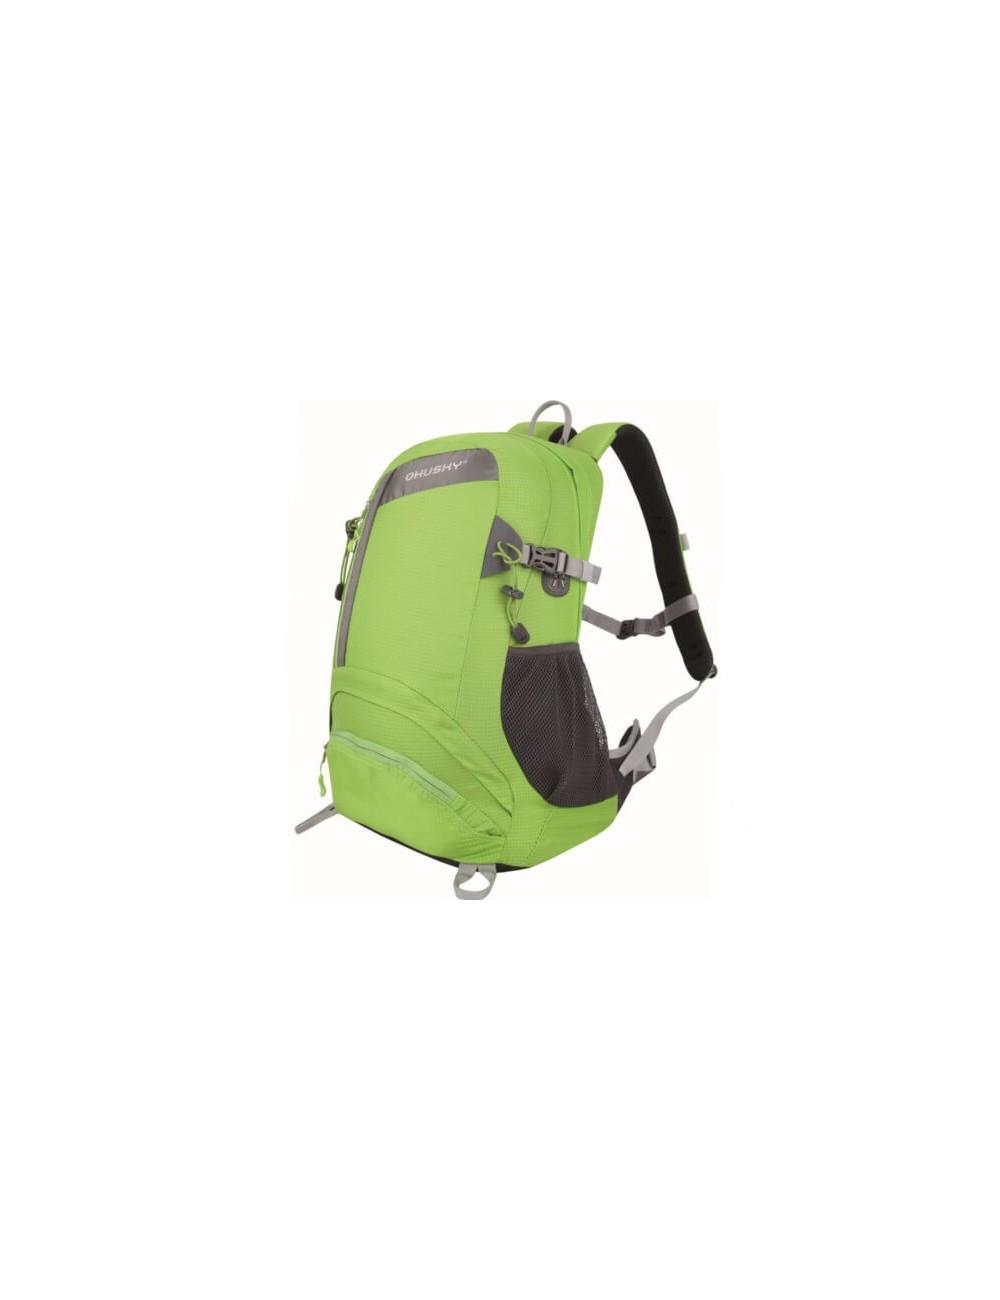 Husky rugzak Stingy Trekking Backpack 28 liter - Groen